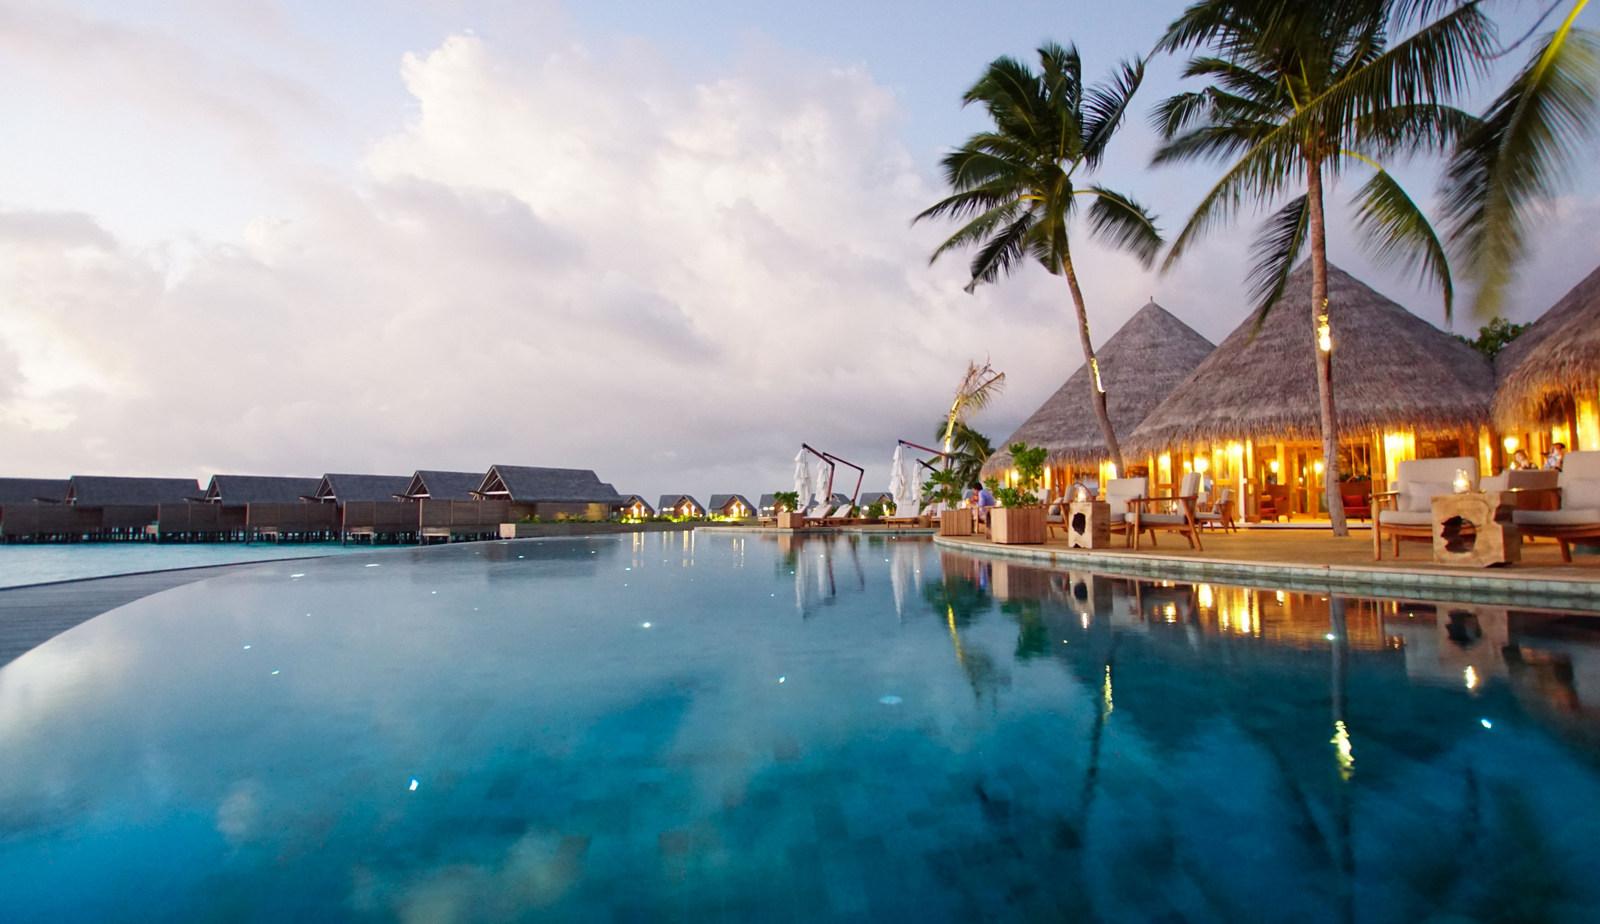 Malediven    die neue Trauminsel Milaidhoo im Baa Atoll strand sonne reisebericht malediven honeymoon 2  TUI Berlin Reisebüro Malediven Milaidhoo Restaurant Goldie Berlin2